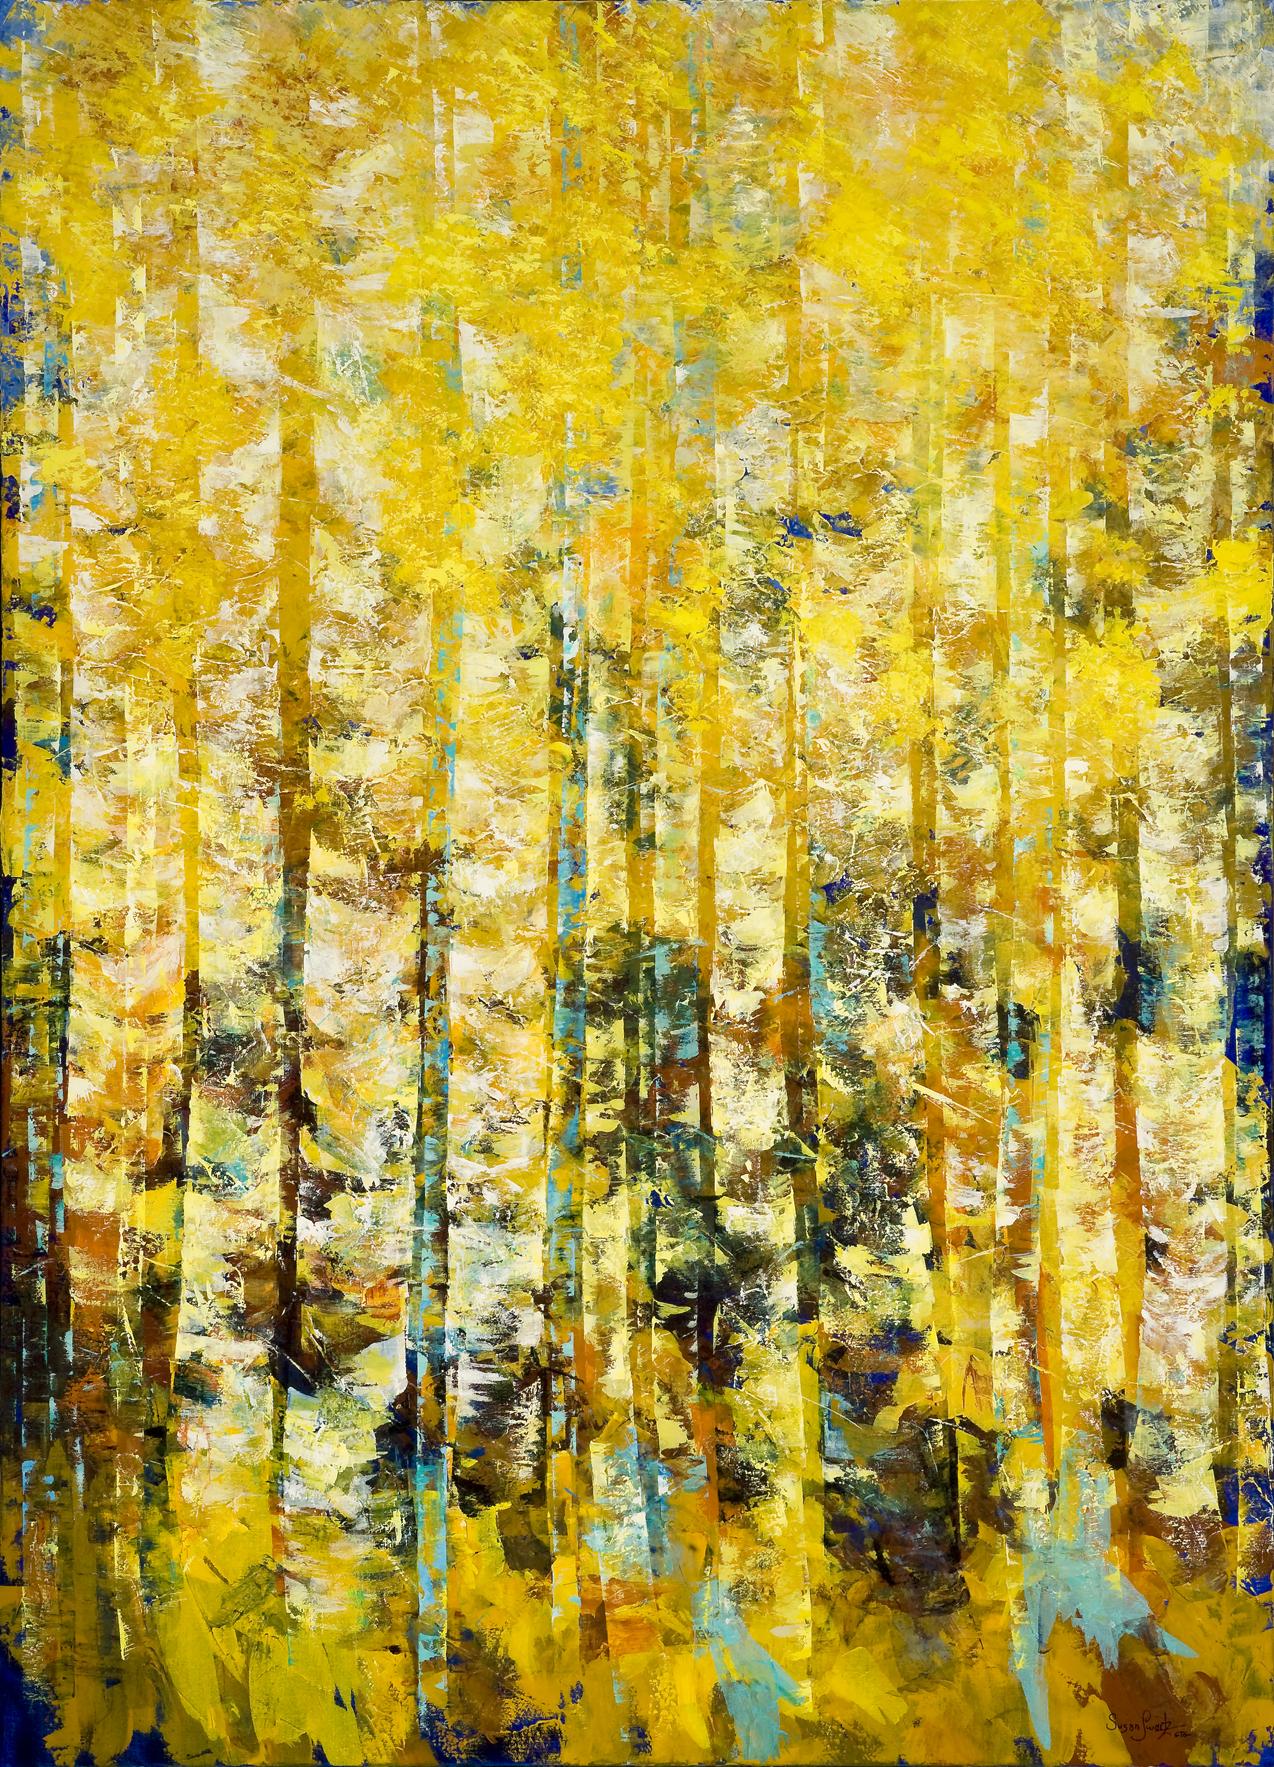 Golden Woodland / Susan Schwartz Art, Abstract landscape